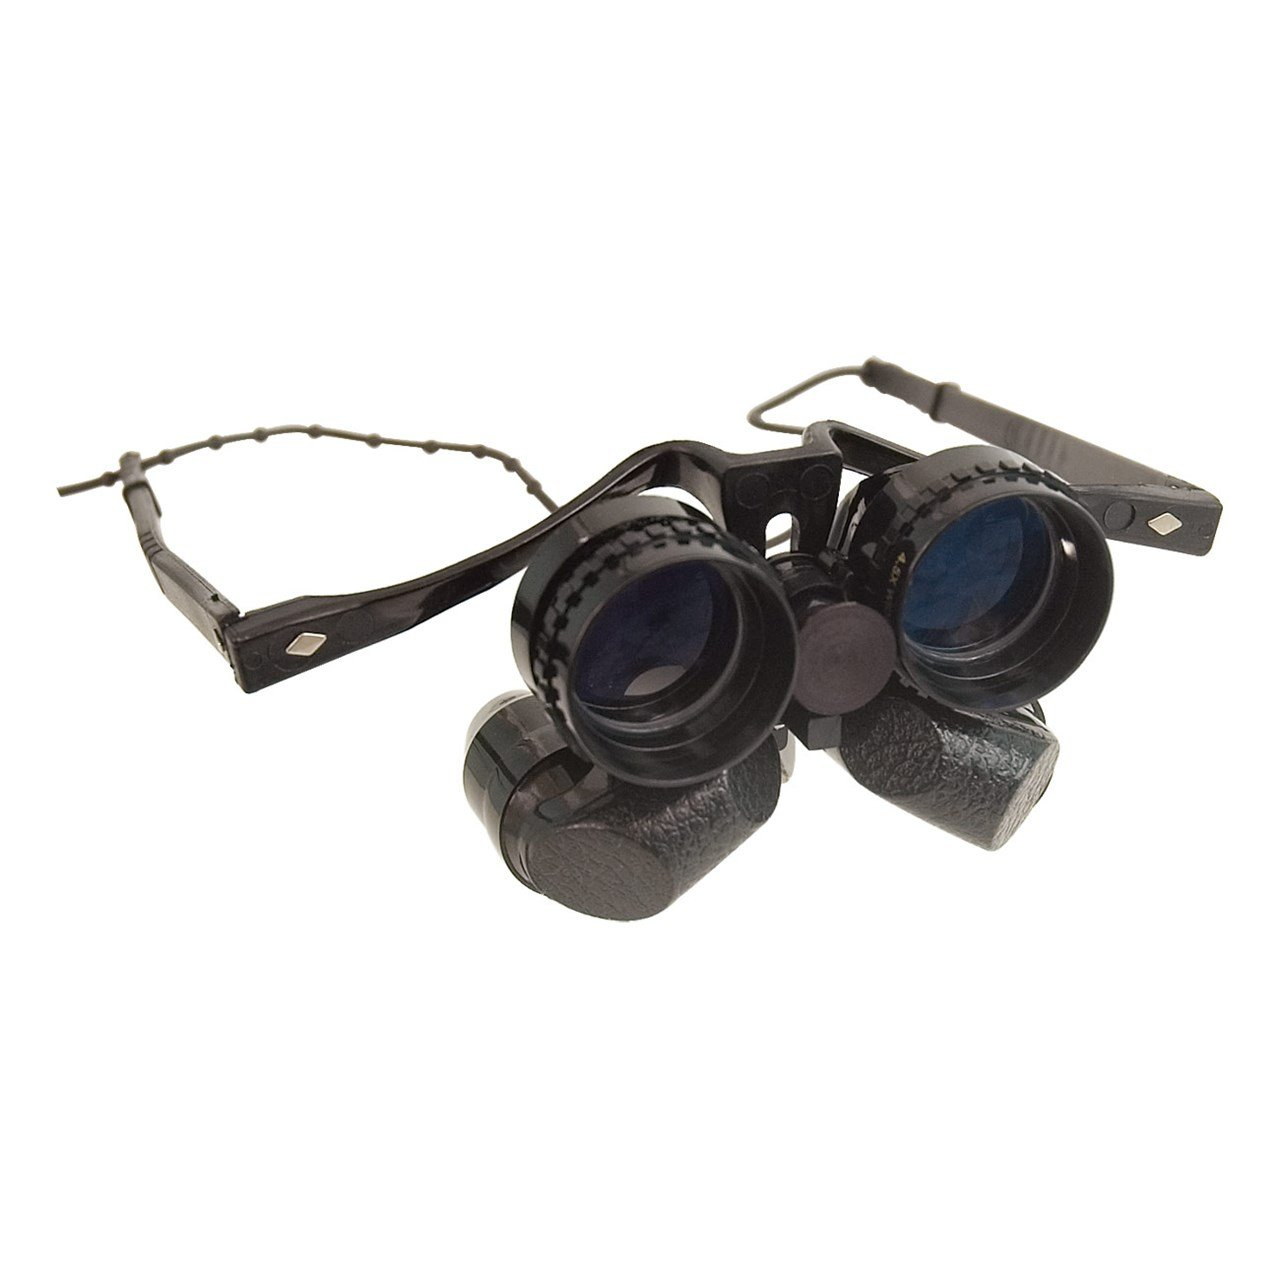 Beecher Mirage 5.5x25 Binocular for Distance Viewing